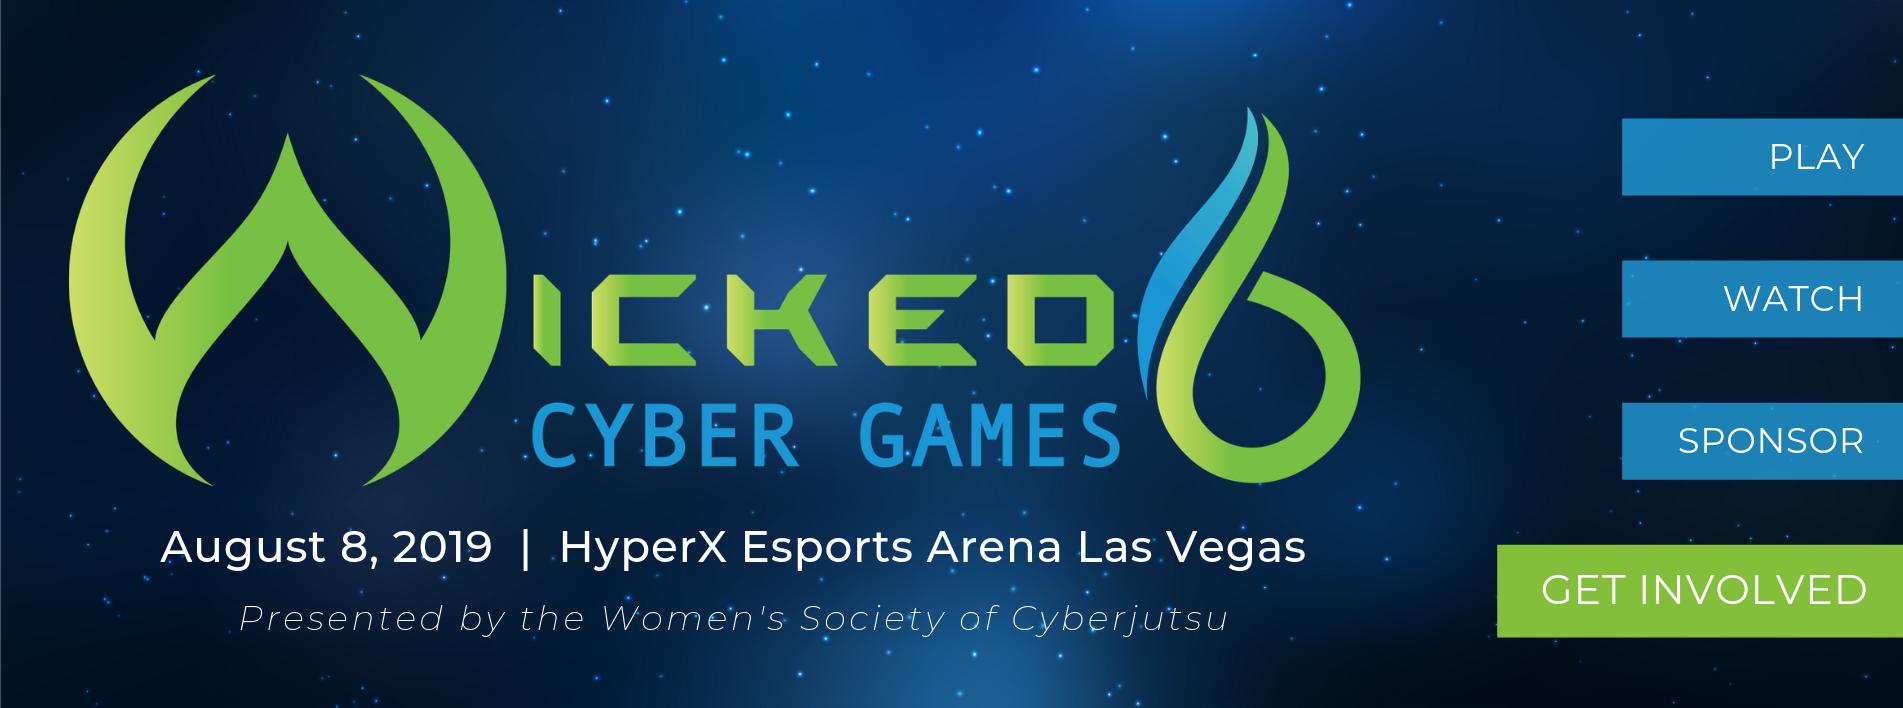 Women's Society of Cyberjutsu